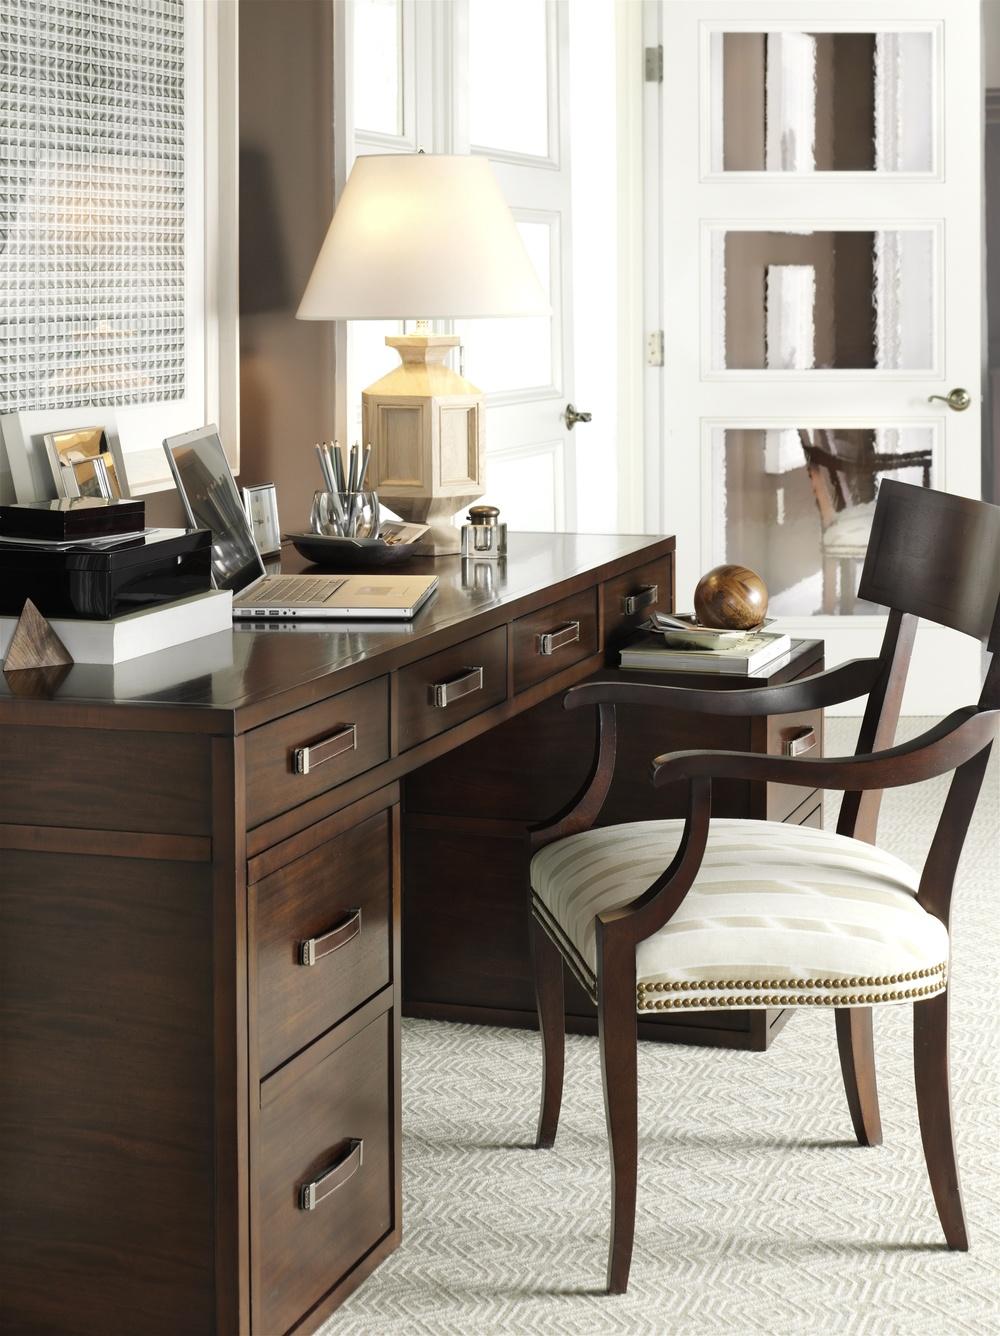 Hickory Chair - Blix Arm Chair